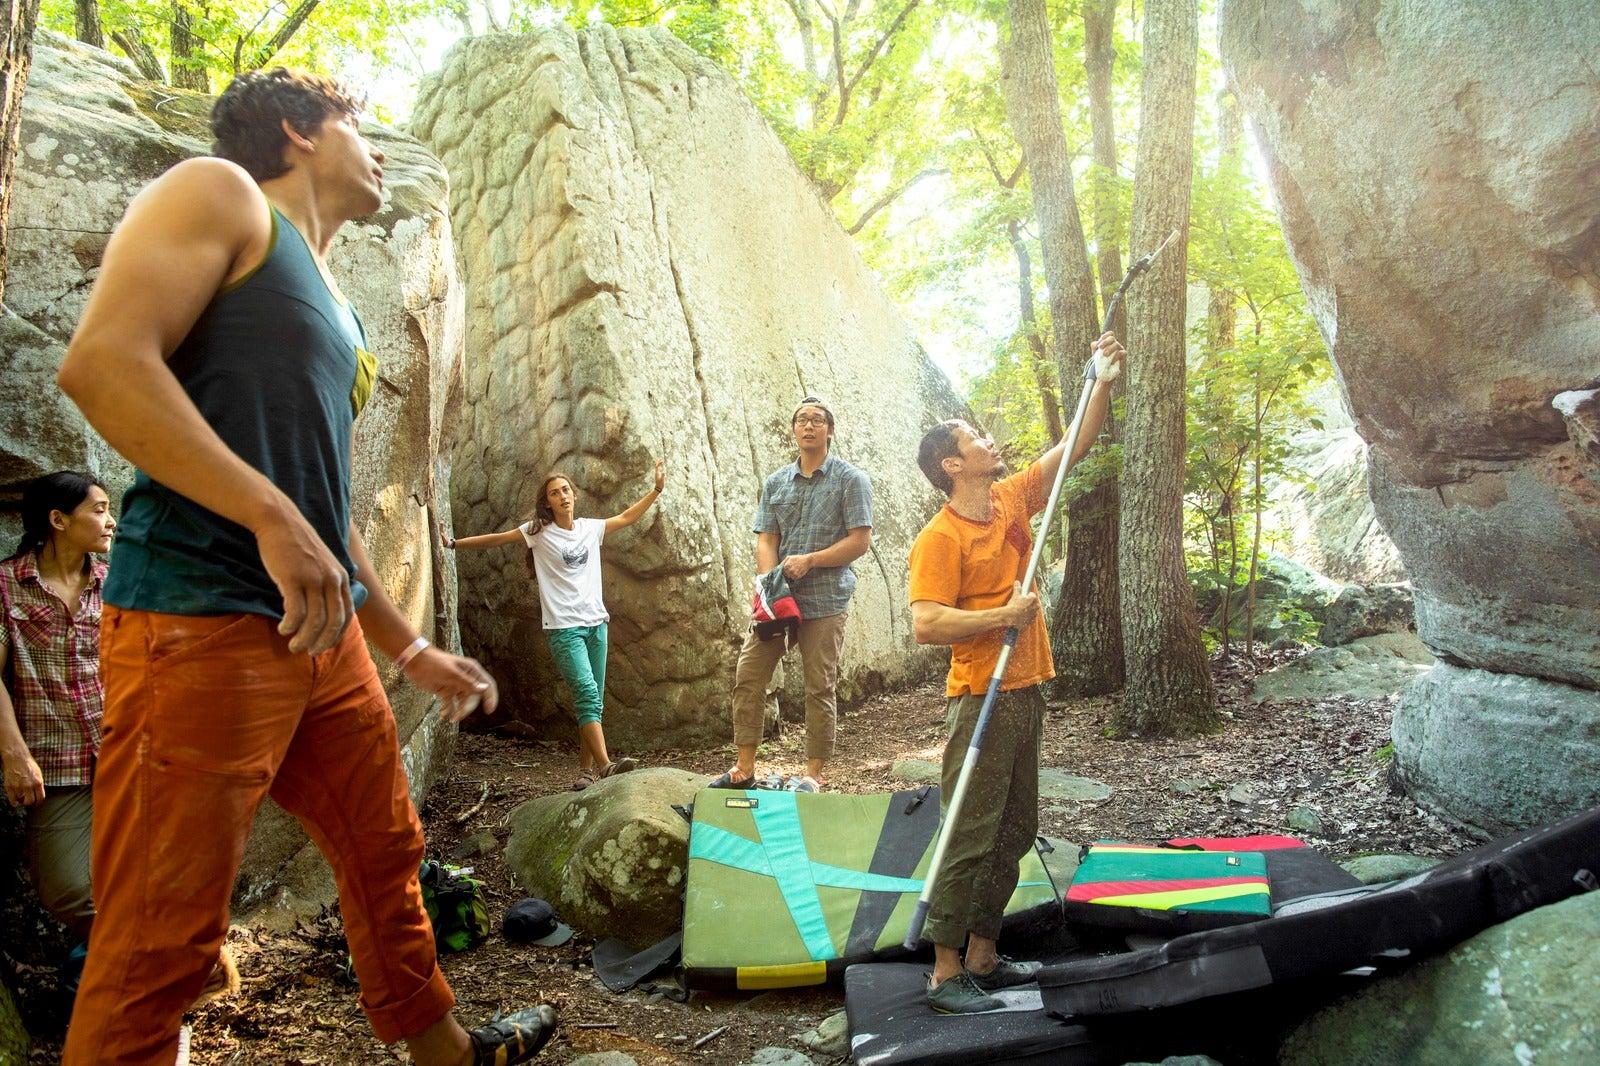 Find Your Dream Bouldering Kit